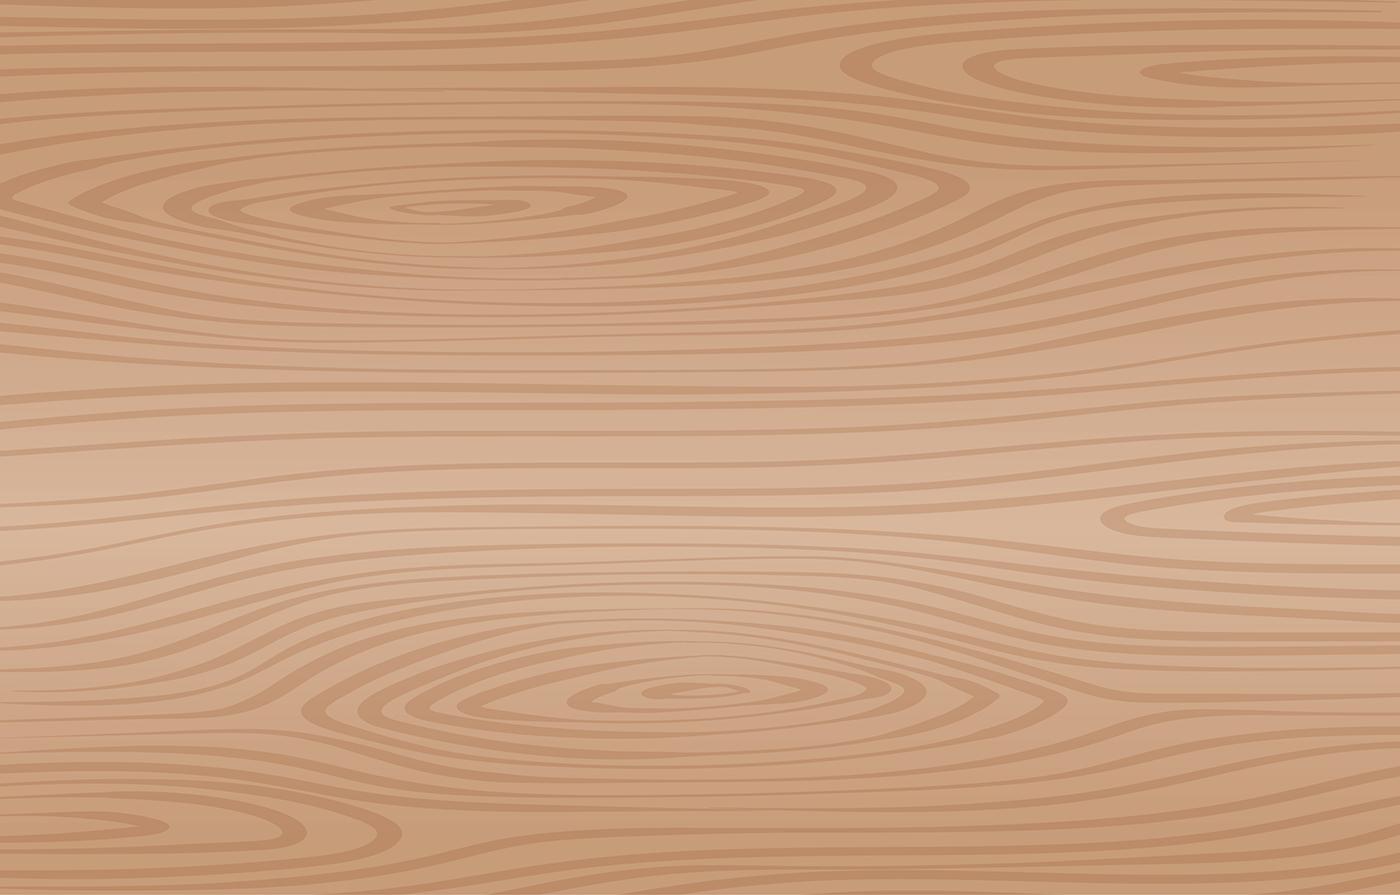 Wood Grain Free Vector Download Vectors Clipart